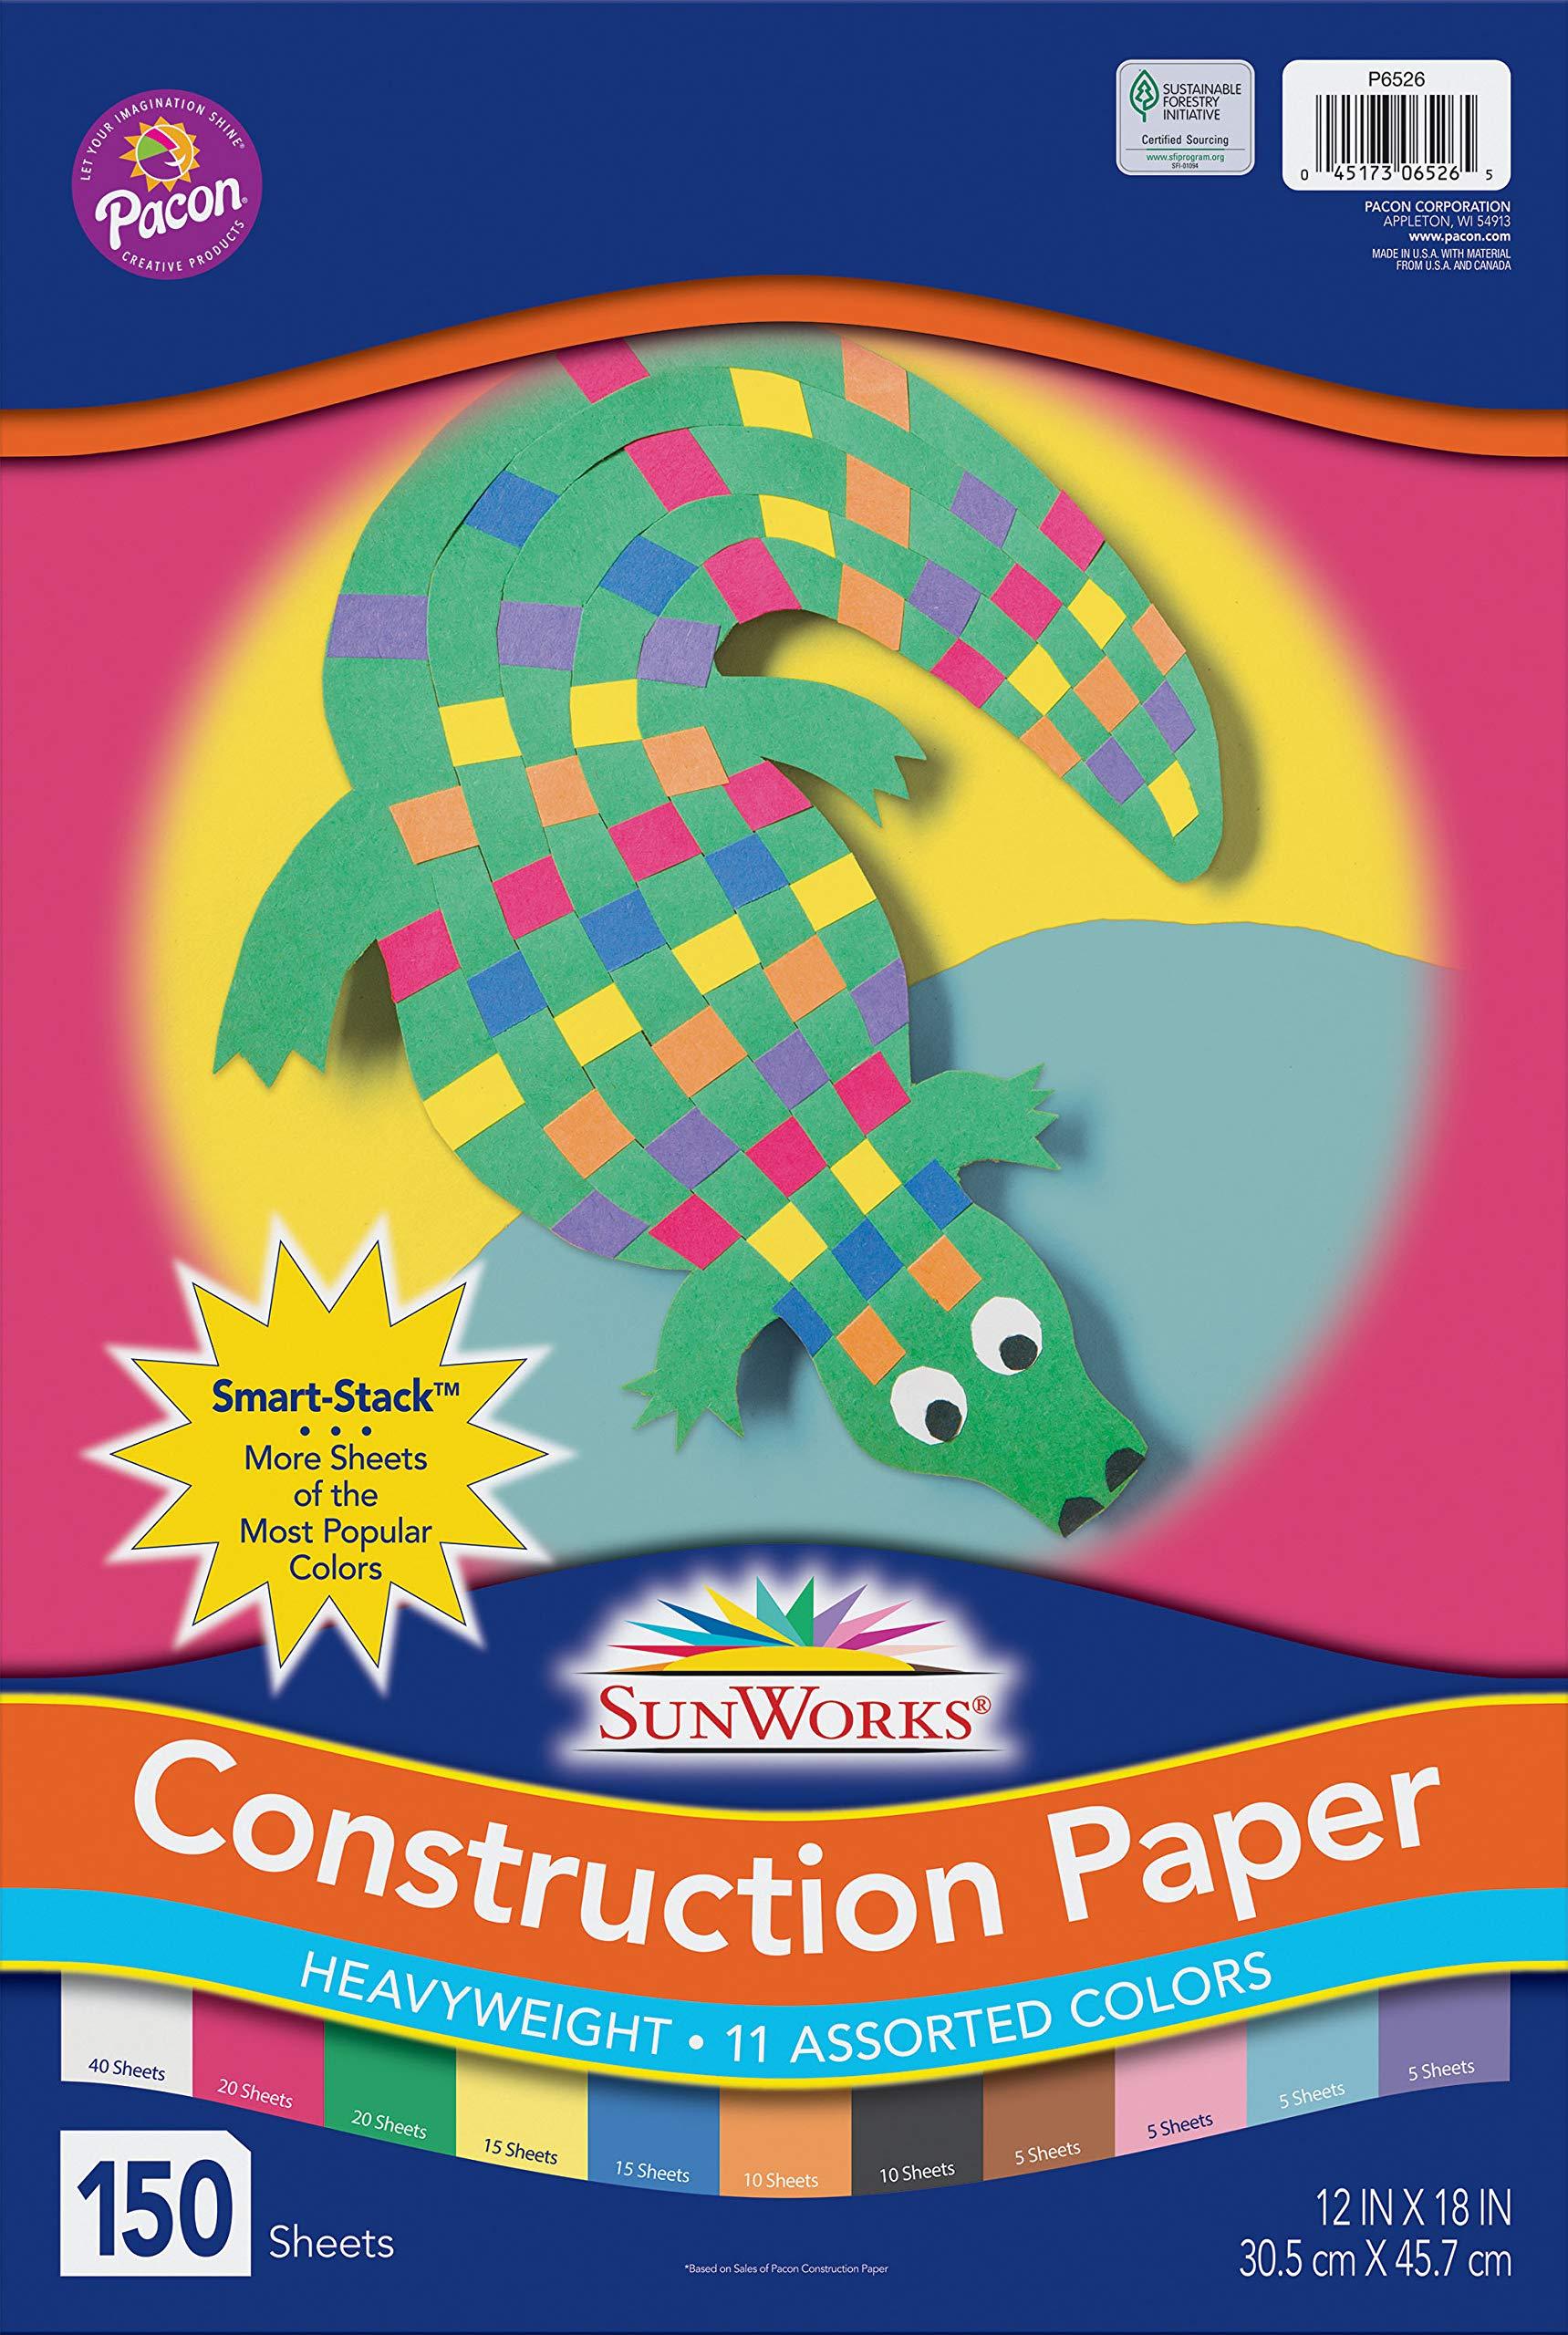 SunWorks PAC9207BN Construction Paper 12 x 18 10 Packs 50 Sheets Per Pack White